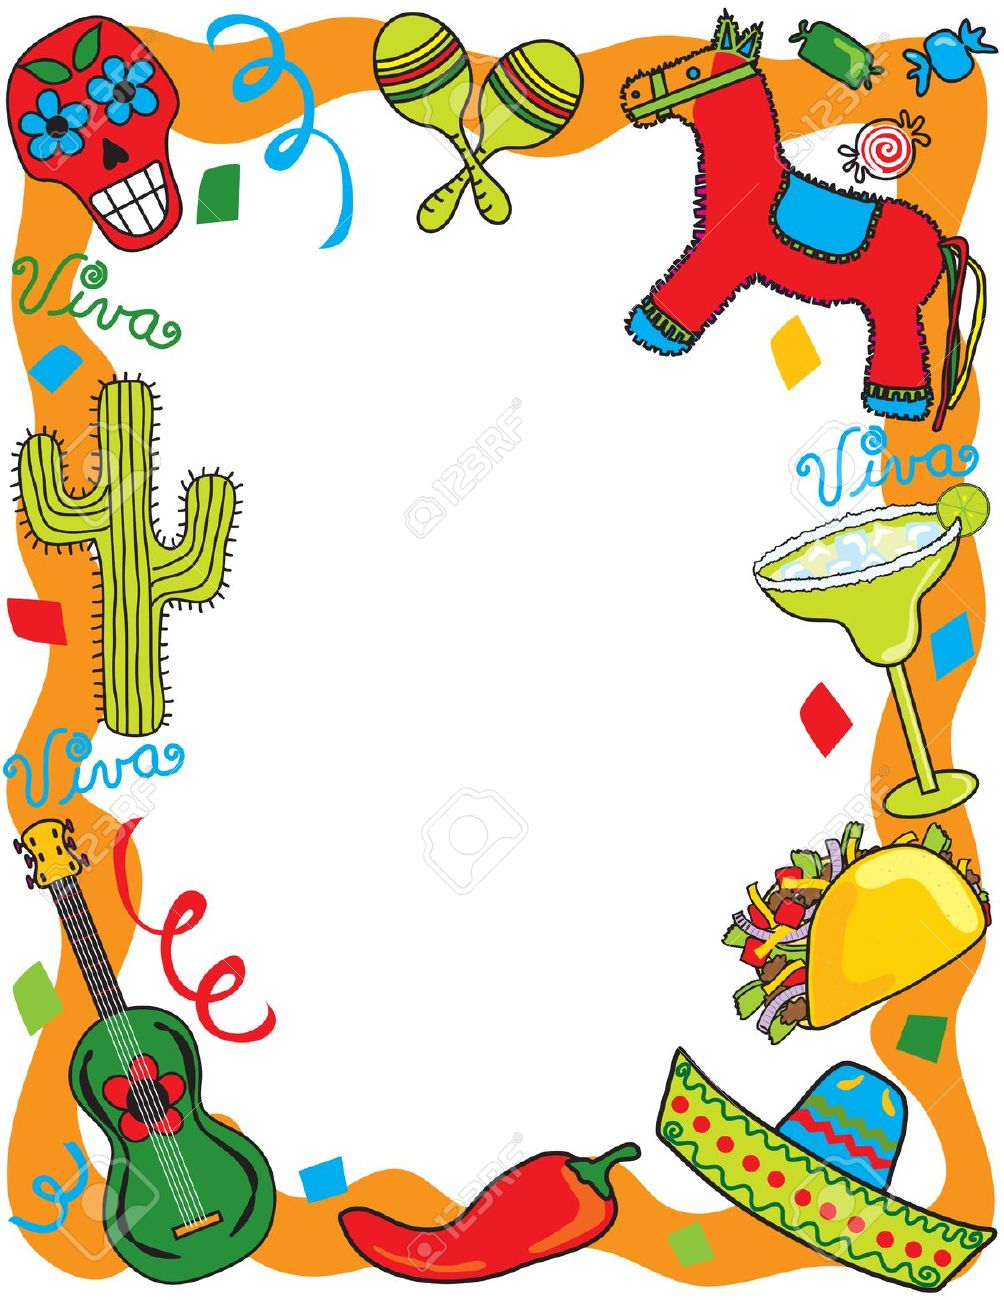 Mexican Fiesta Party Invitation Royalty Free Cliparts, Vectors